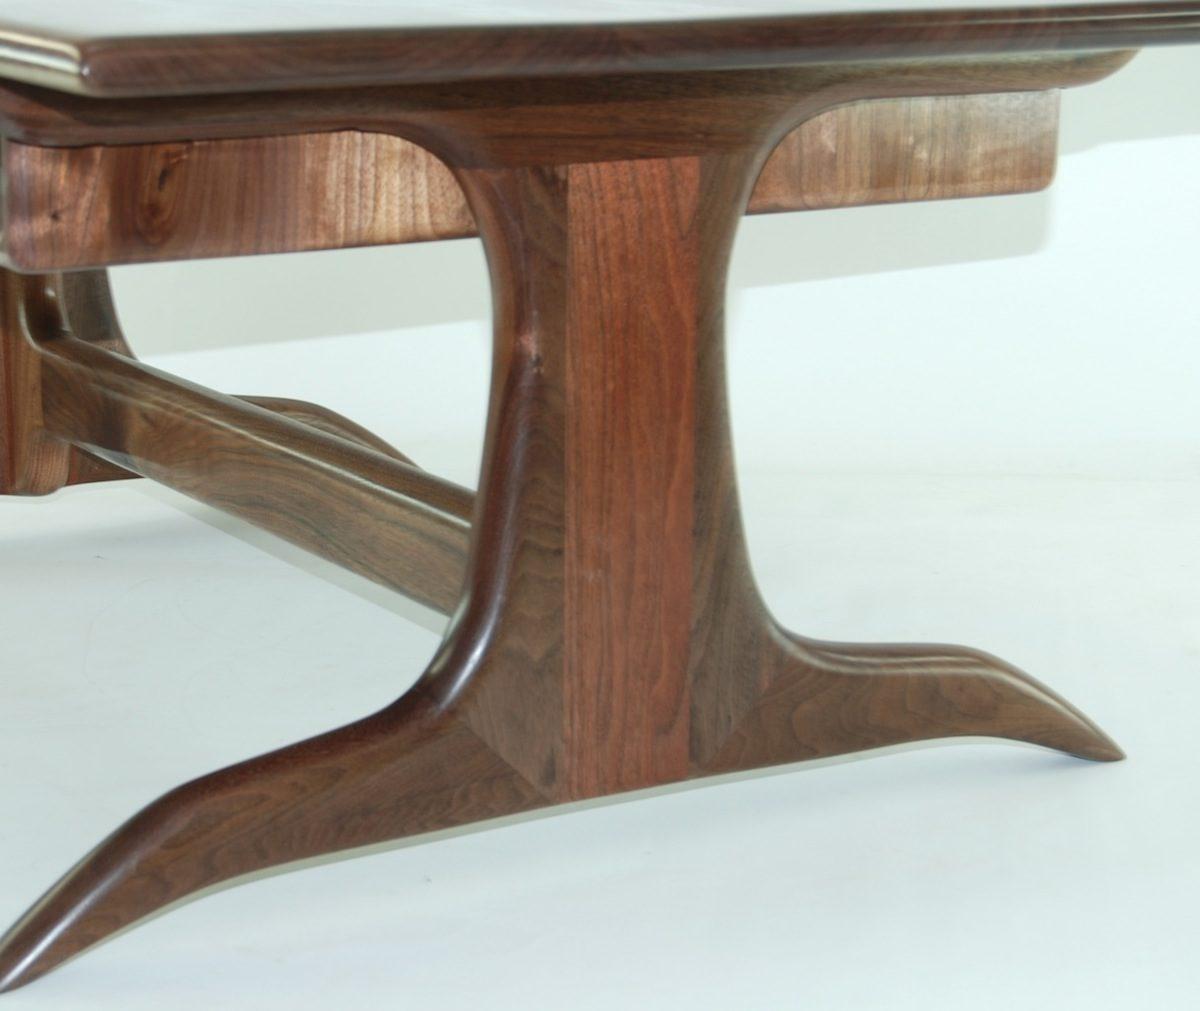 Walnut trestle coffee table finewoodworking for Trestle coffee table